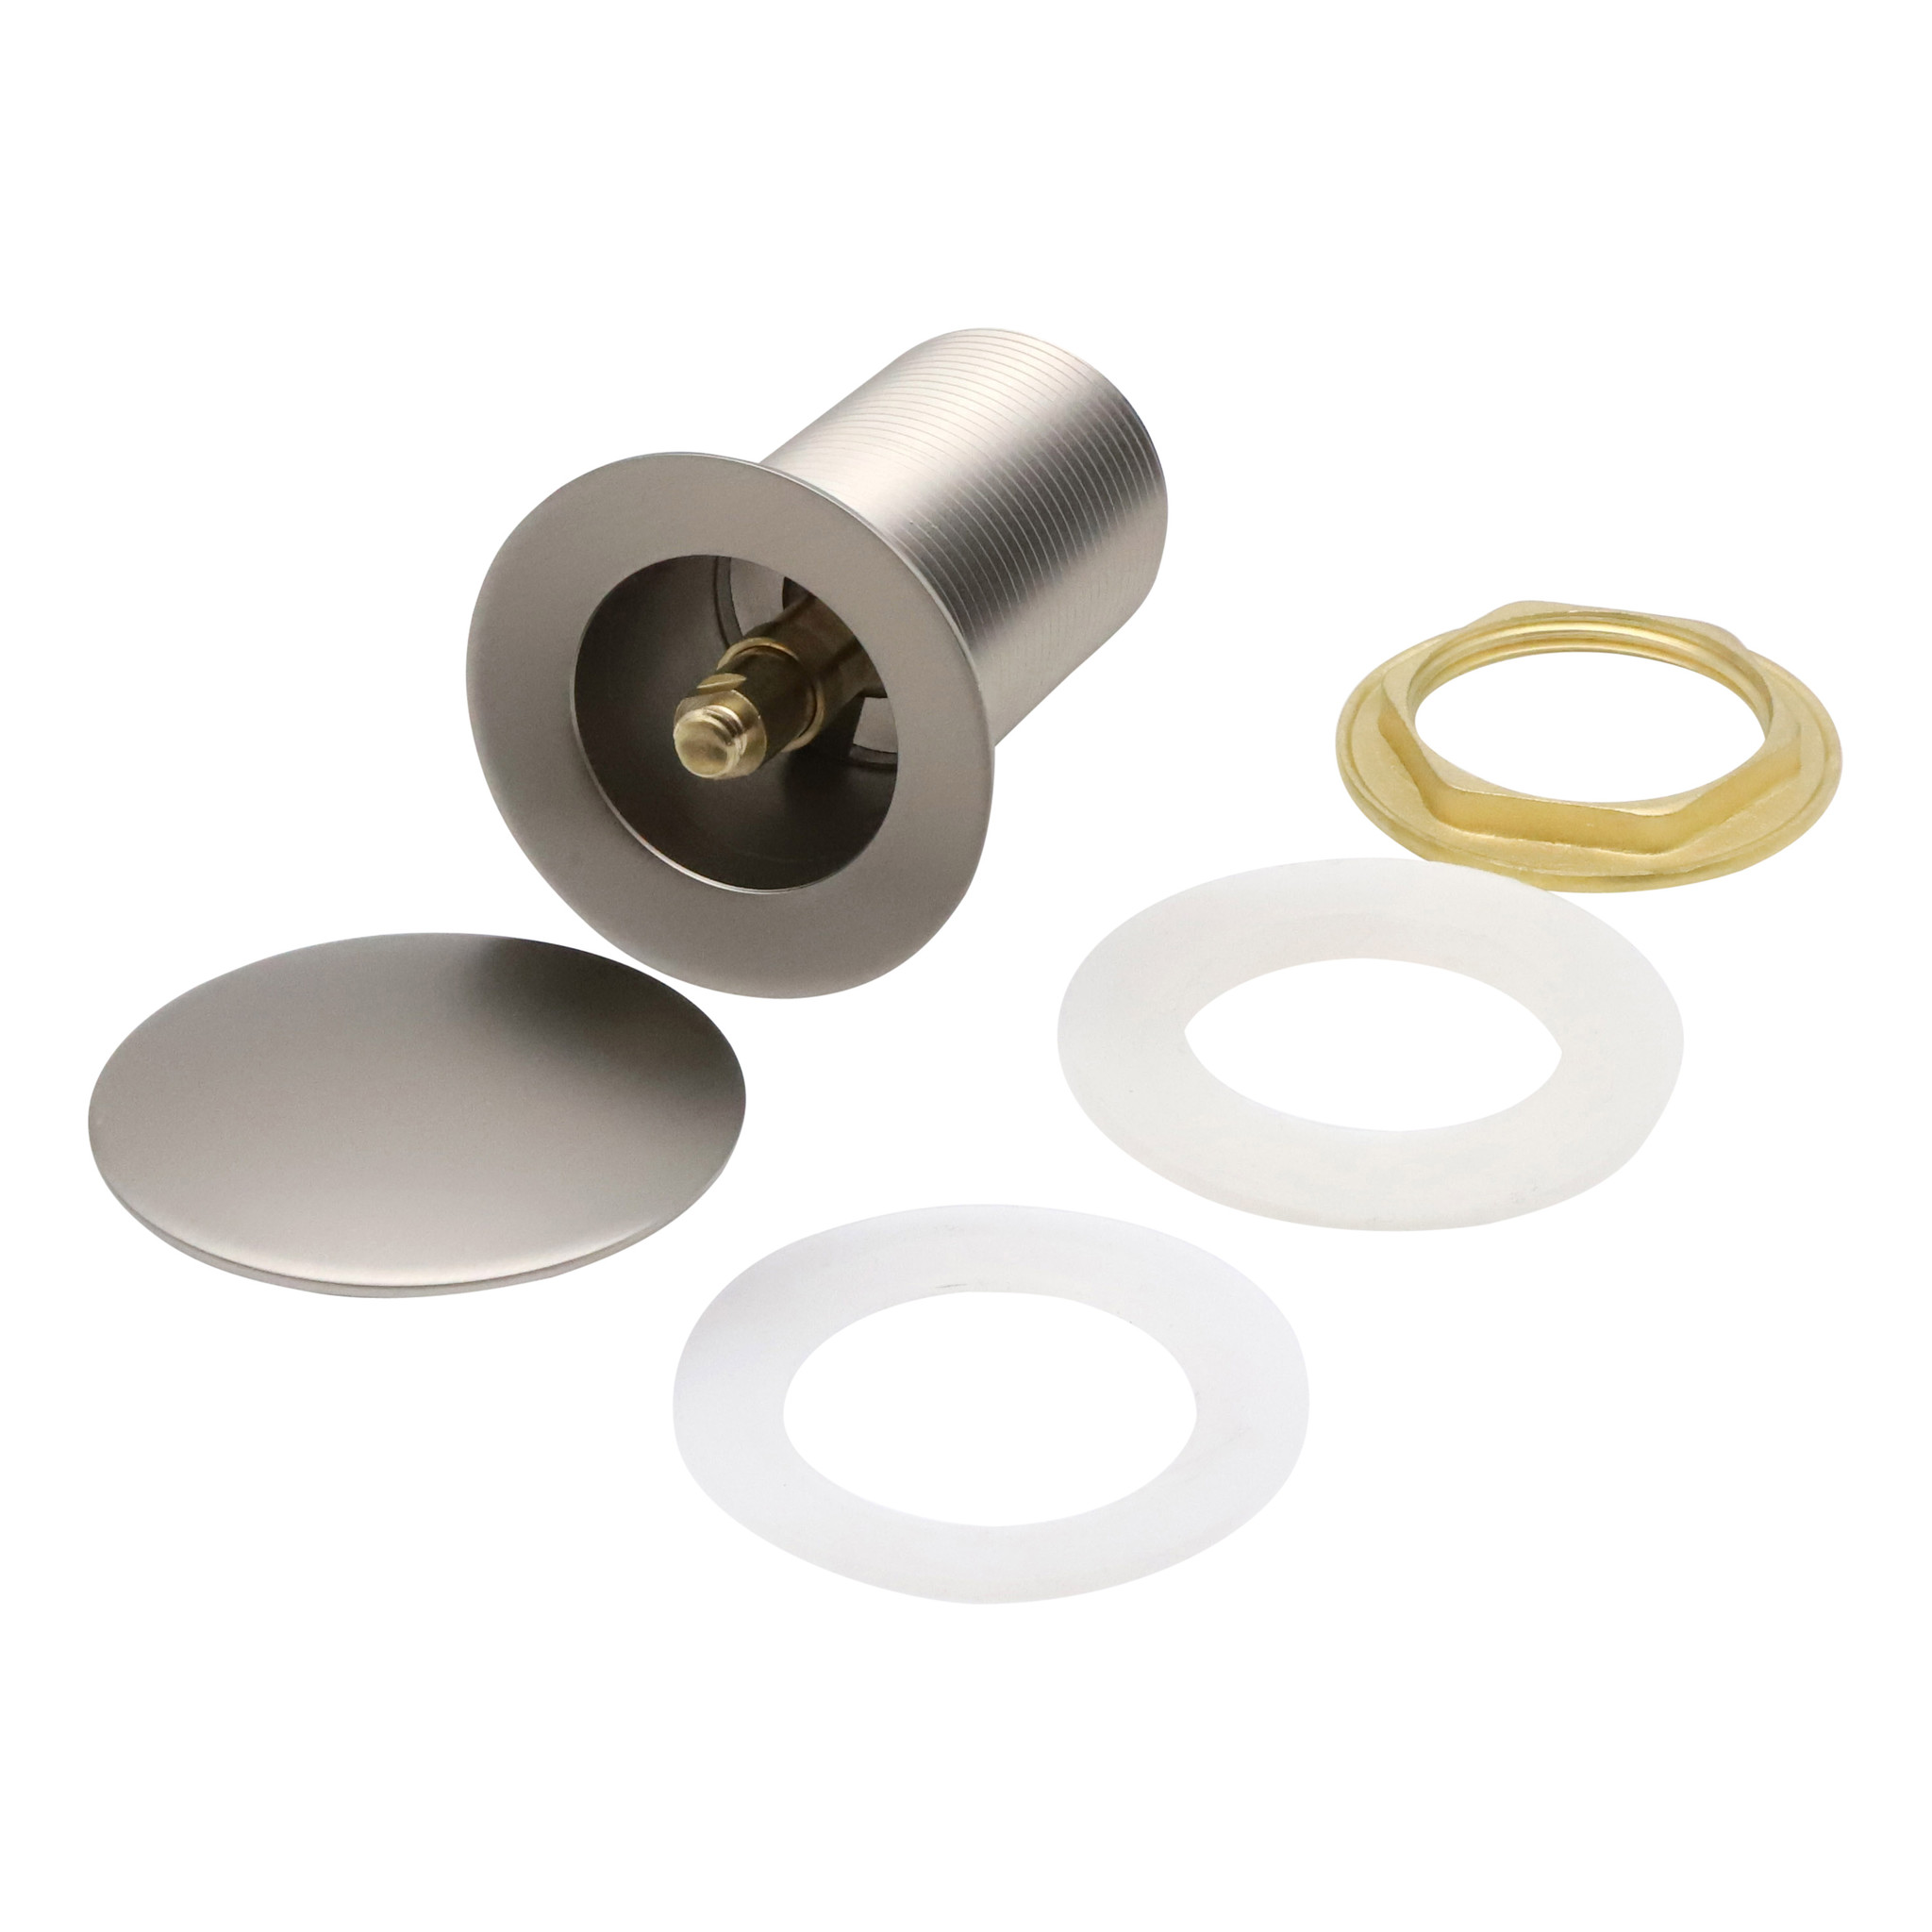 Indomarmer Pop-up Drain Plug with Long Shaft 9 cm Brushed Nickel